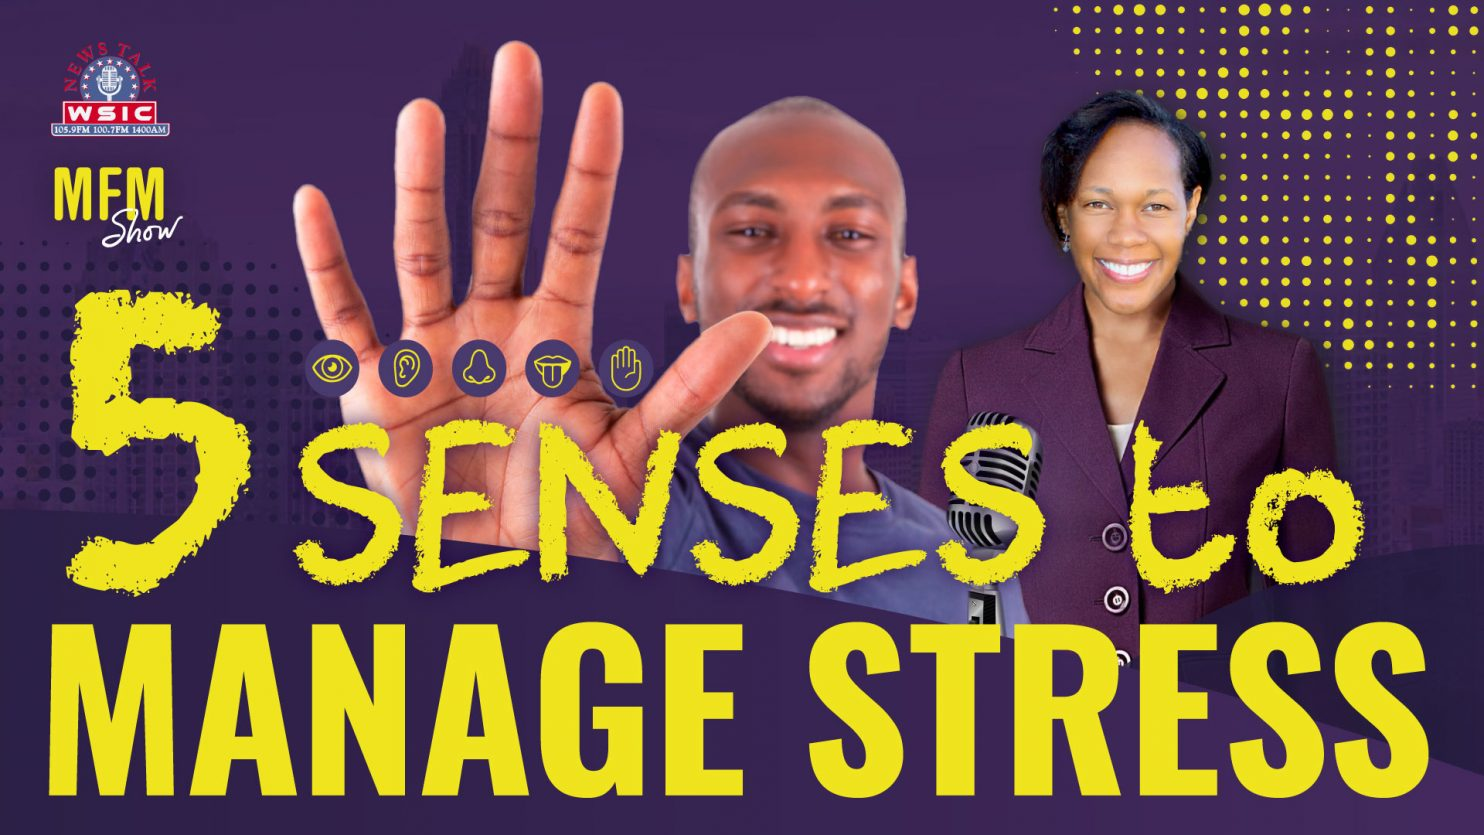 Five Senses to Manage Stress